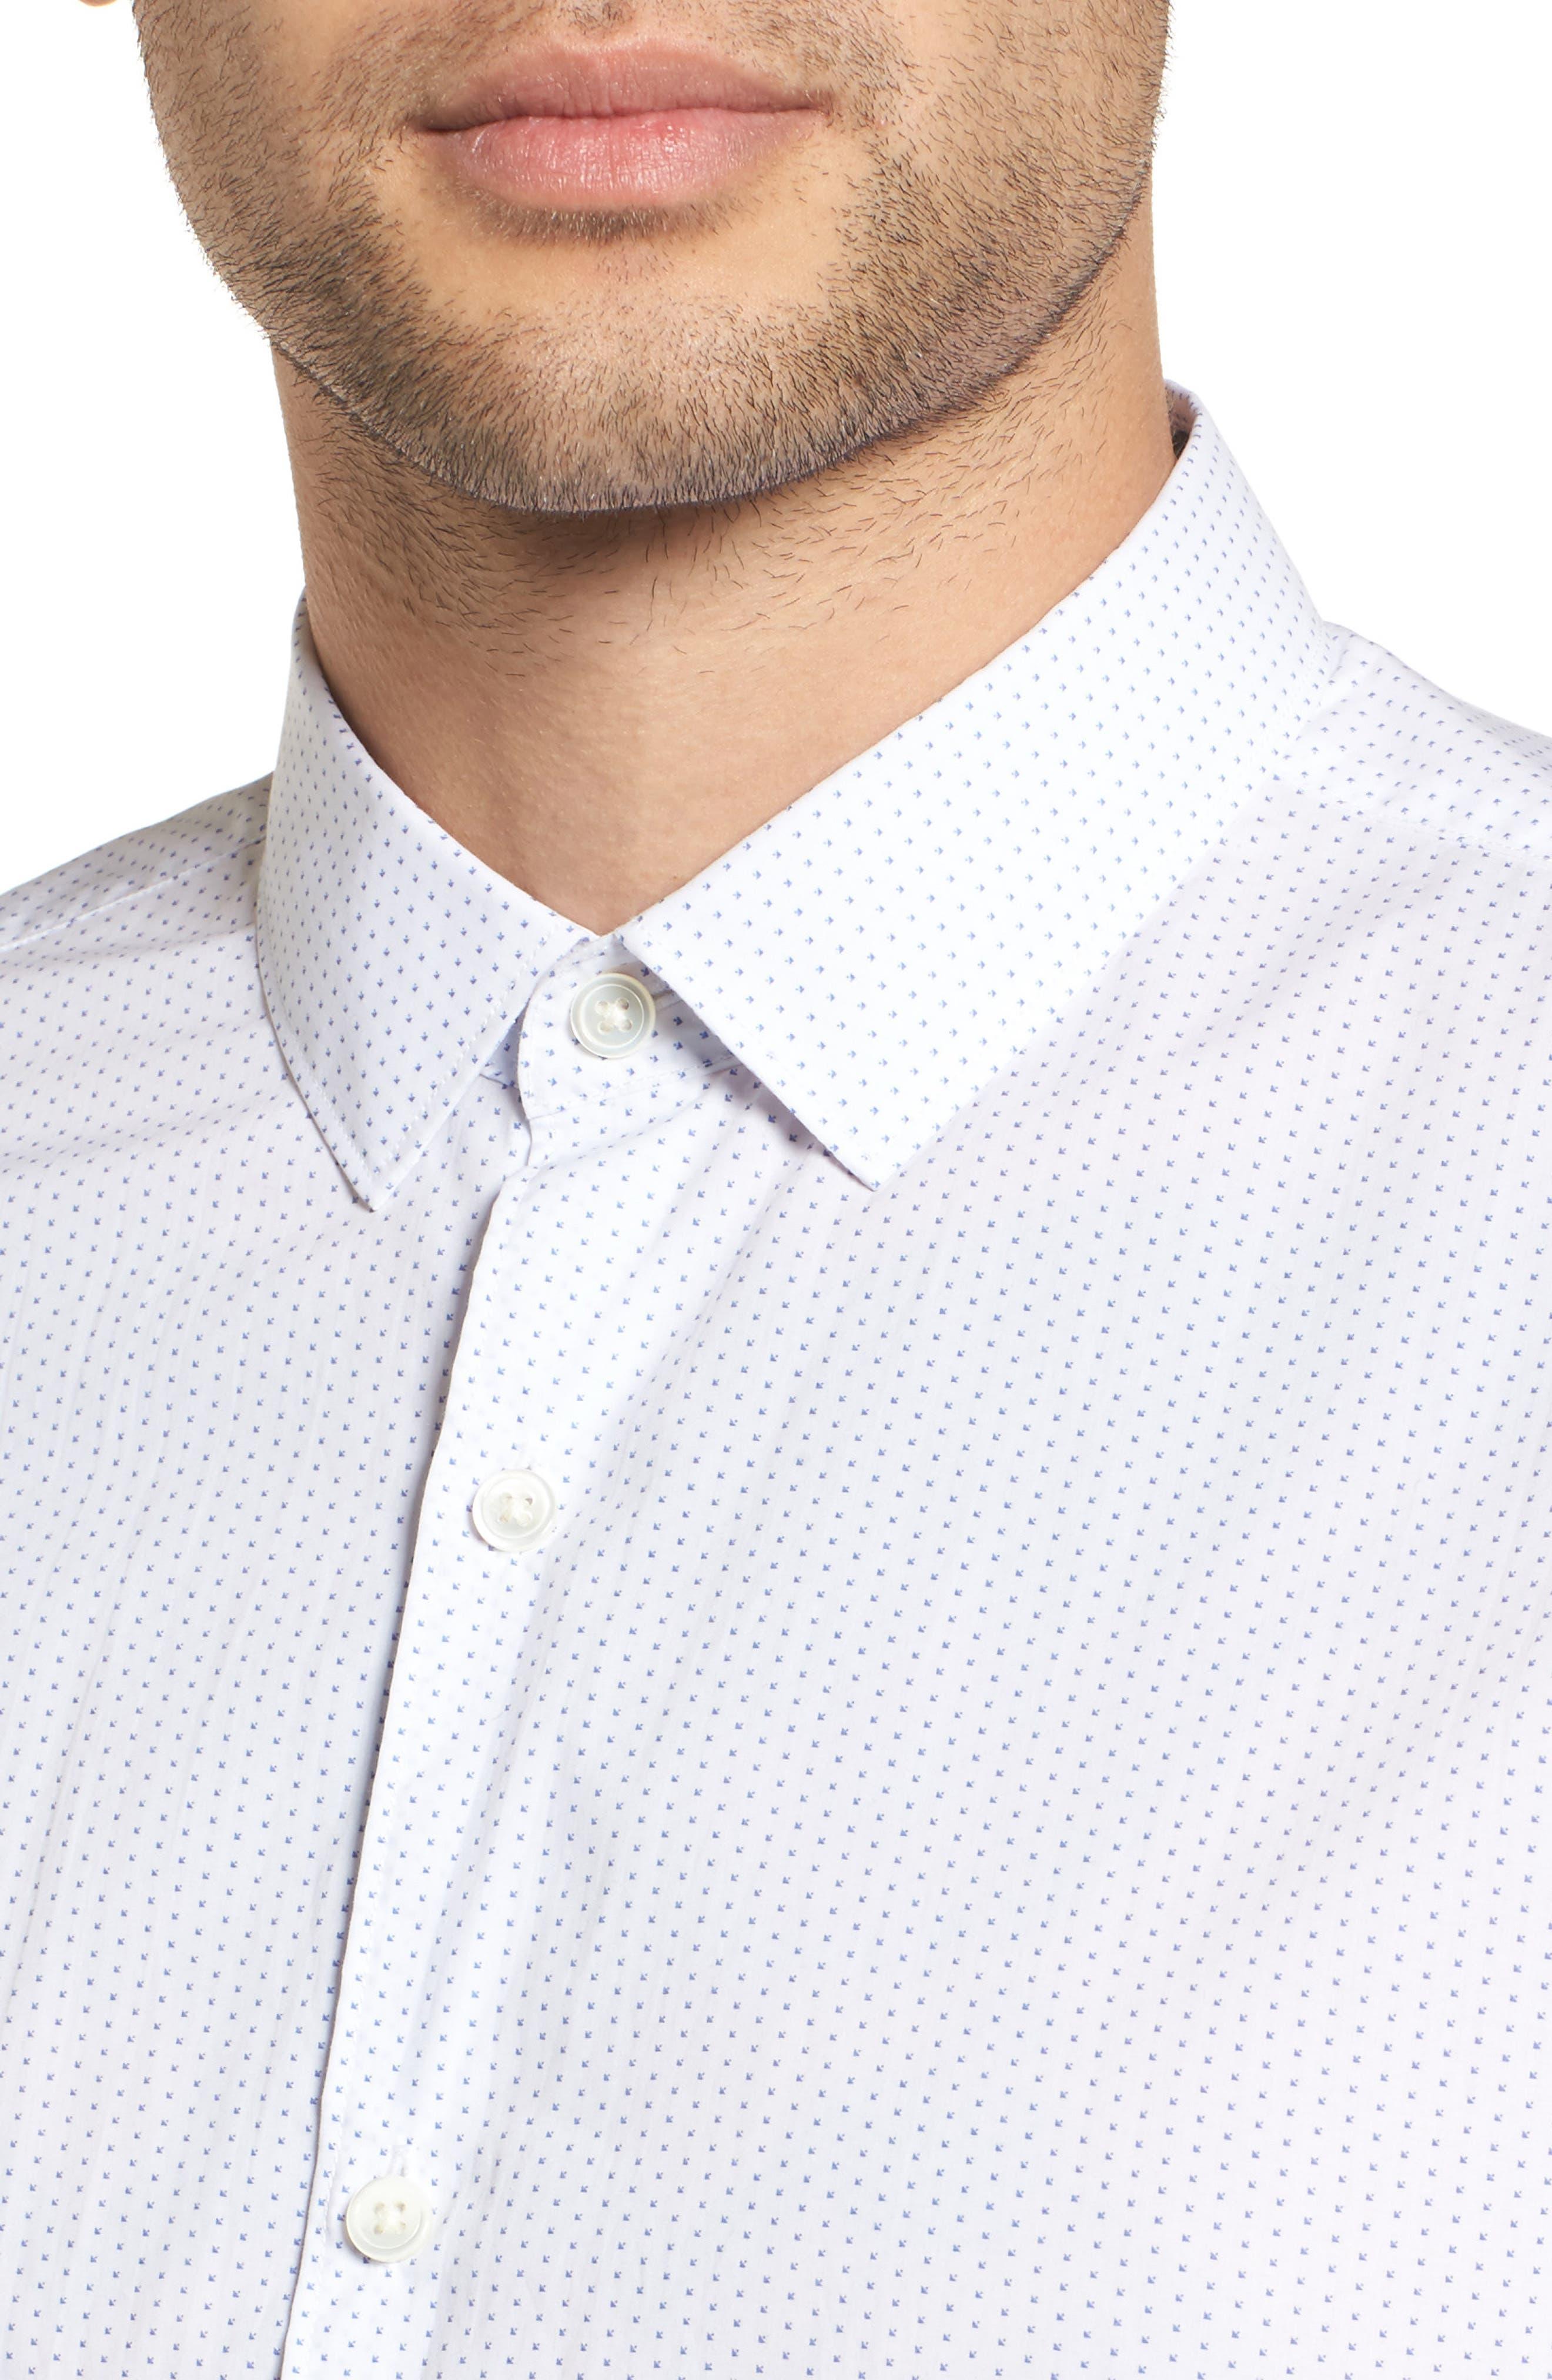 Murray Slim Fit Sport Shirt,                             Alternate thumbnail 7, color,